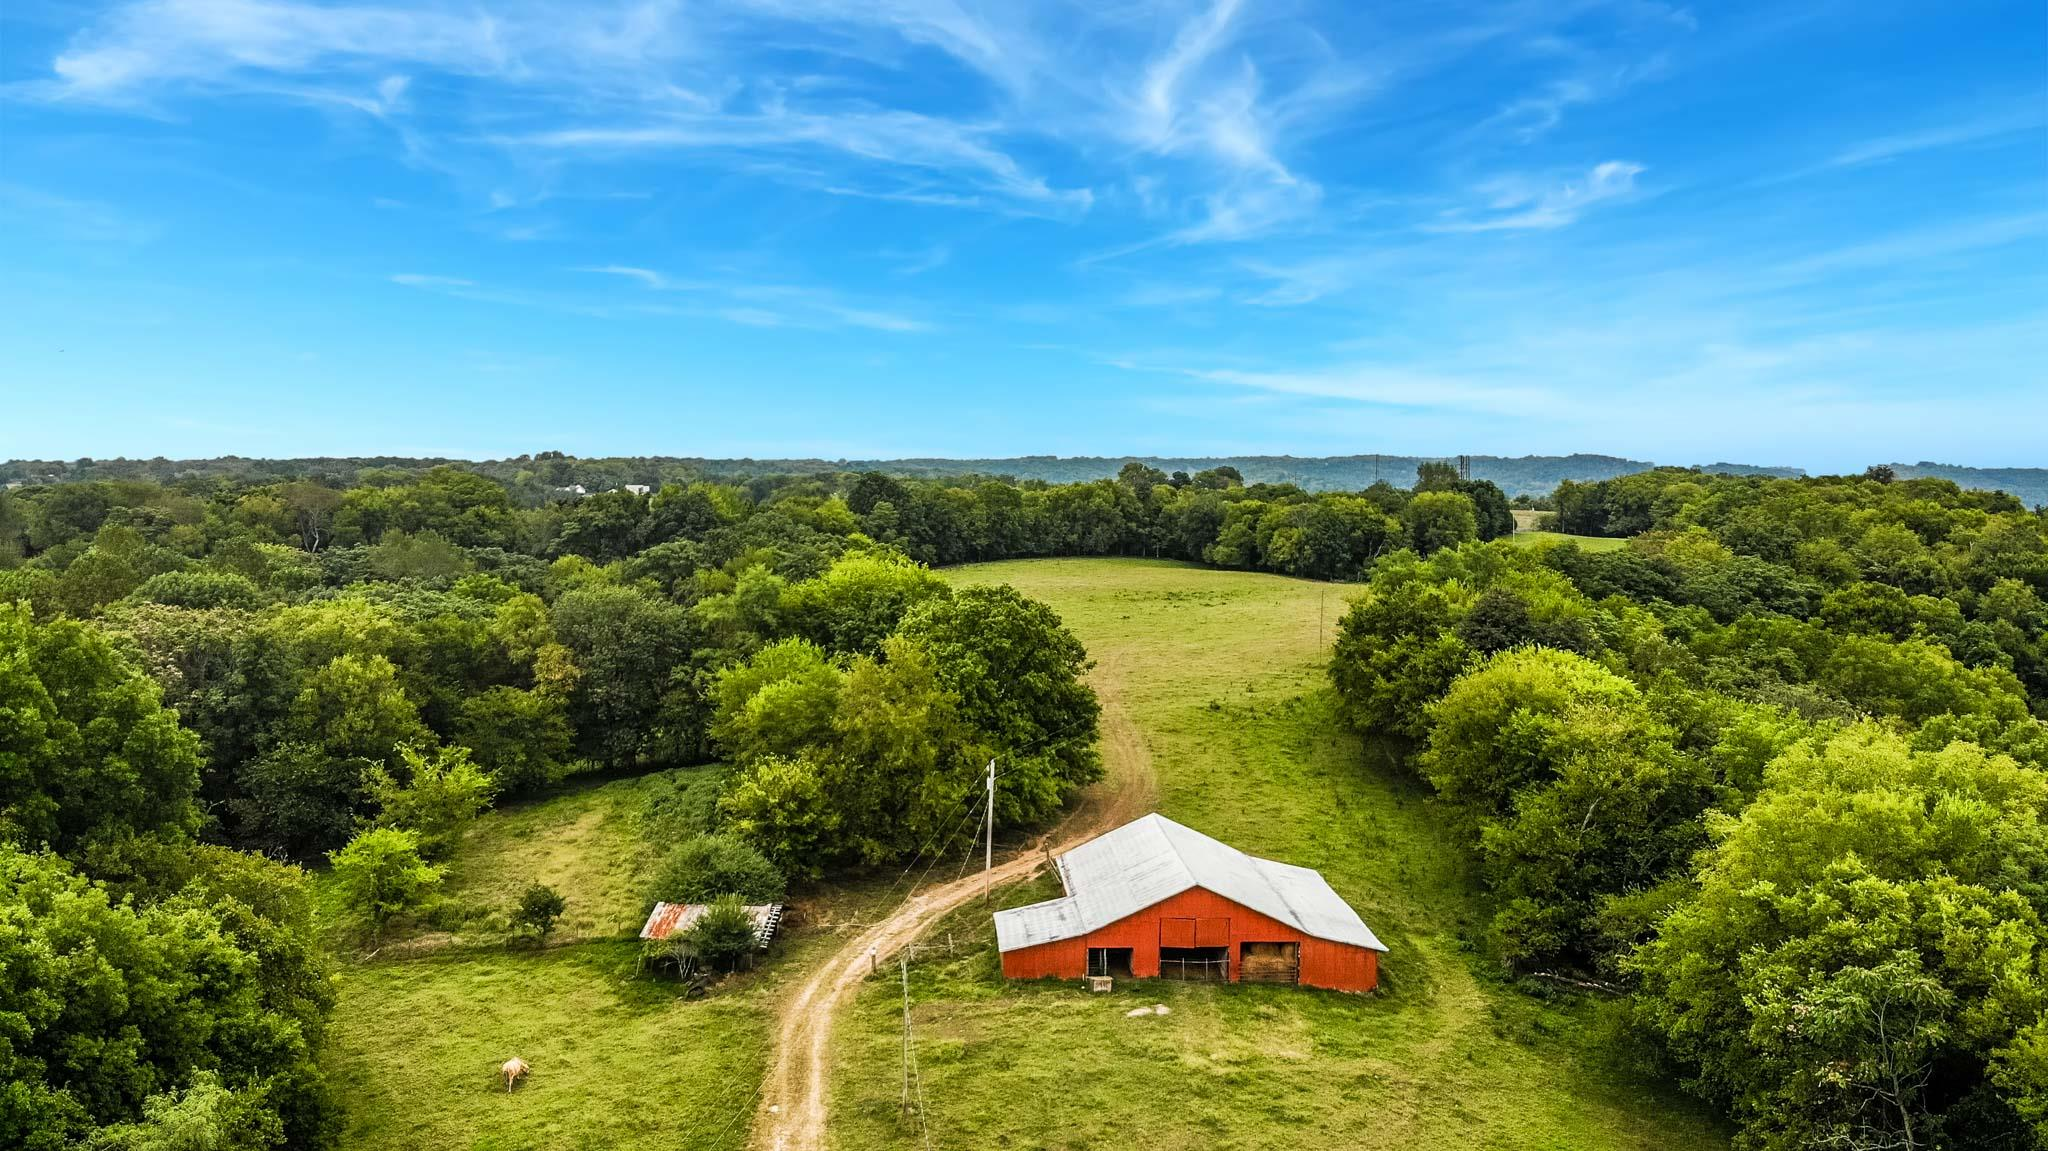 1401 Bledsoe Rd, Pulaski, TN 38478 - Pulaski, TN real estate listing